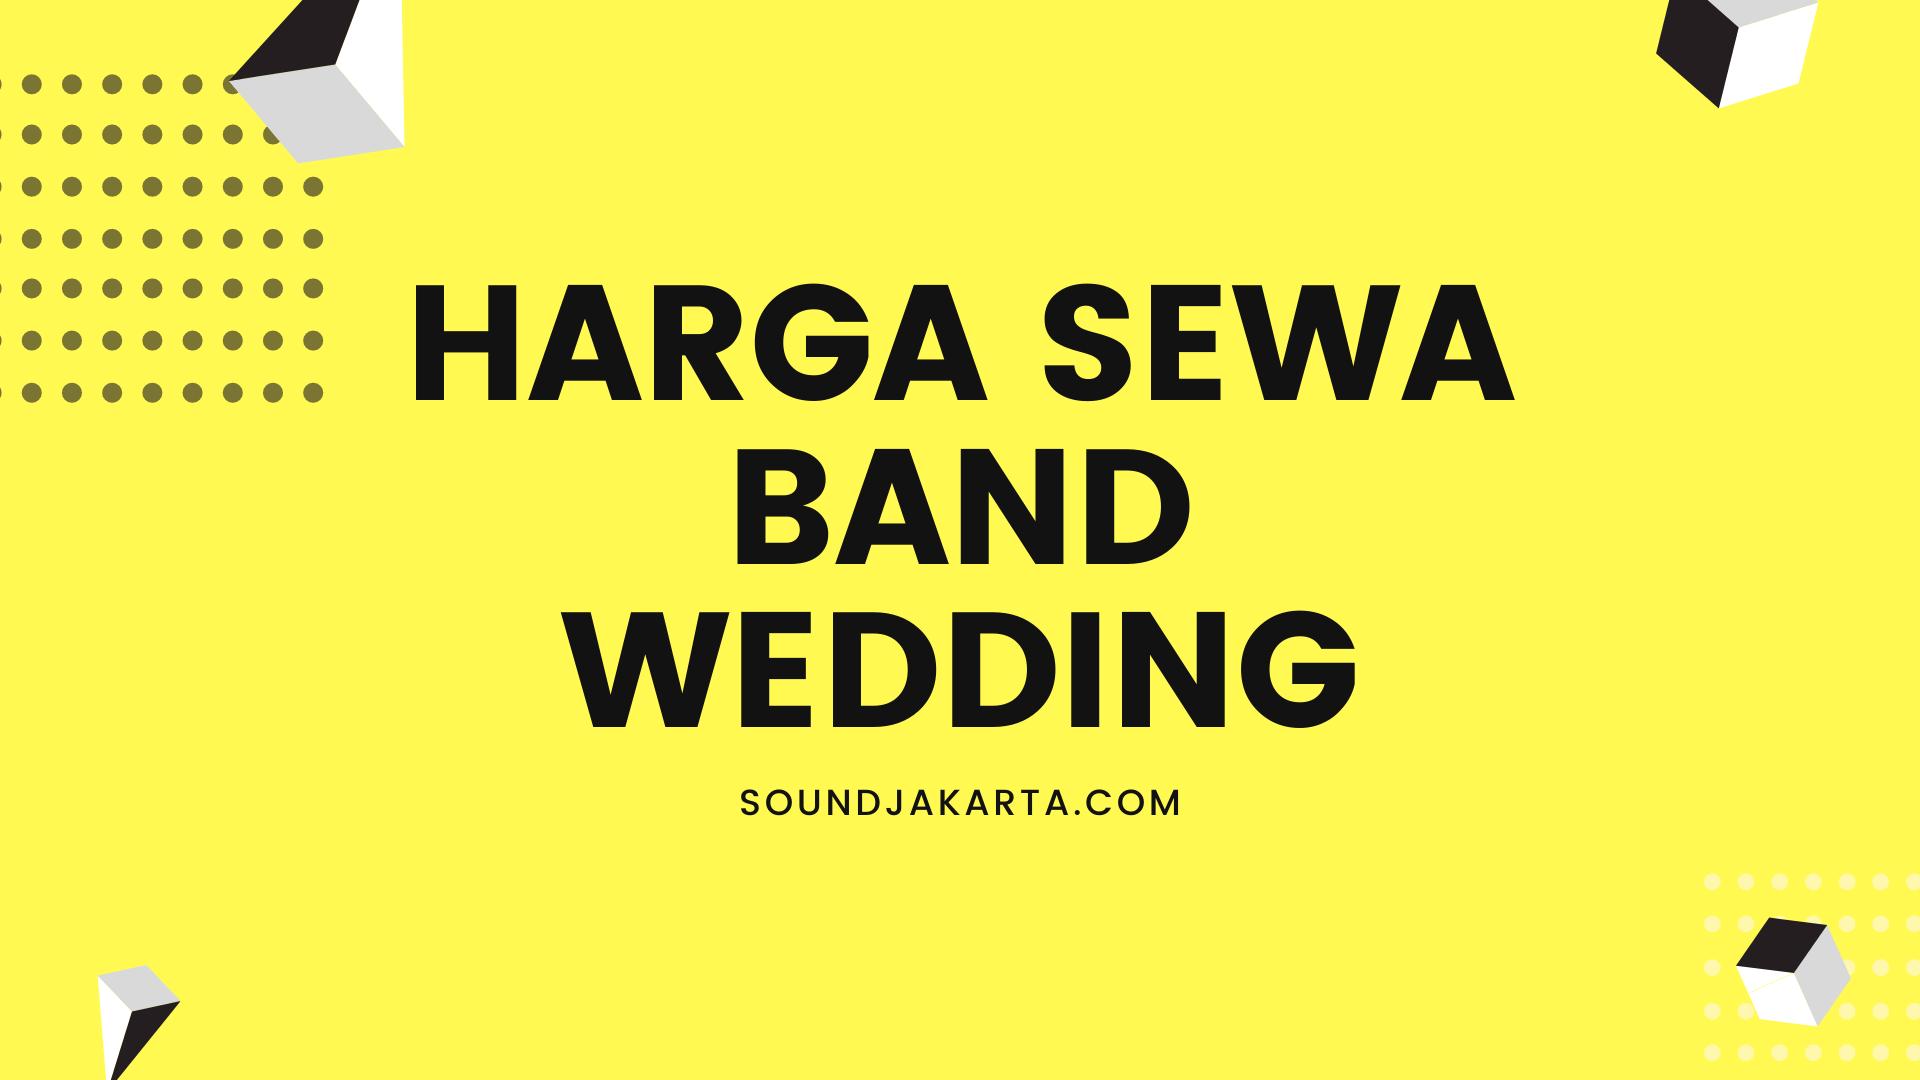 harga sewa band wedding